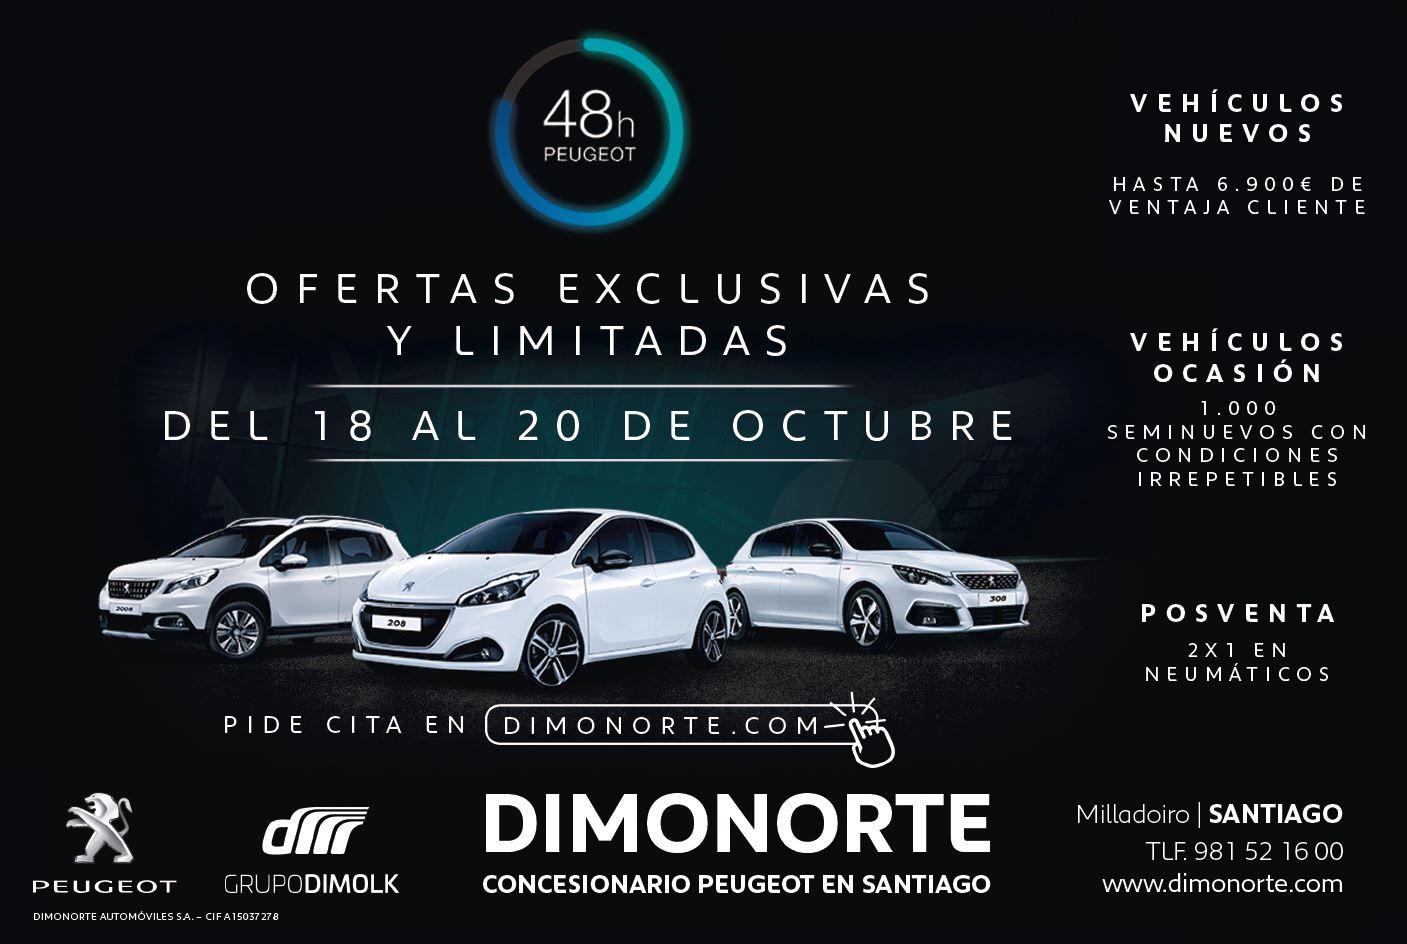 48 HORAS PEUGEOT DIMONORTE DEL 18 AL 20 DE OCTUBRE